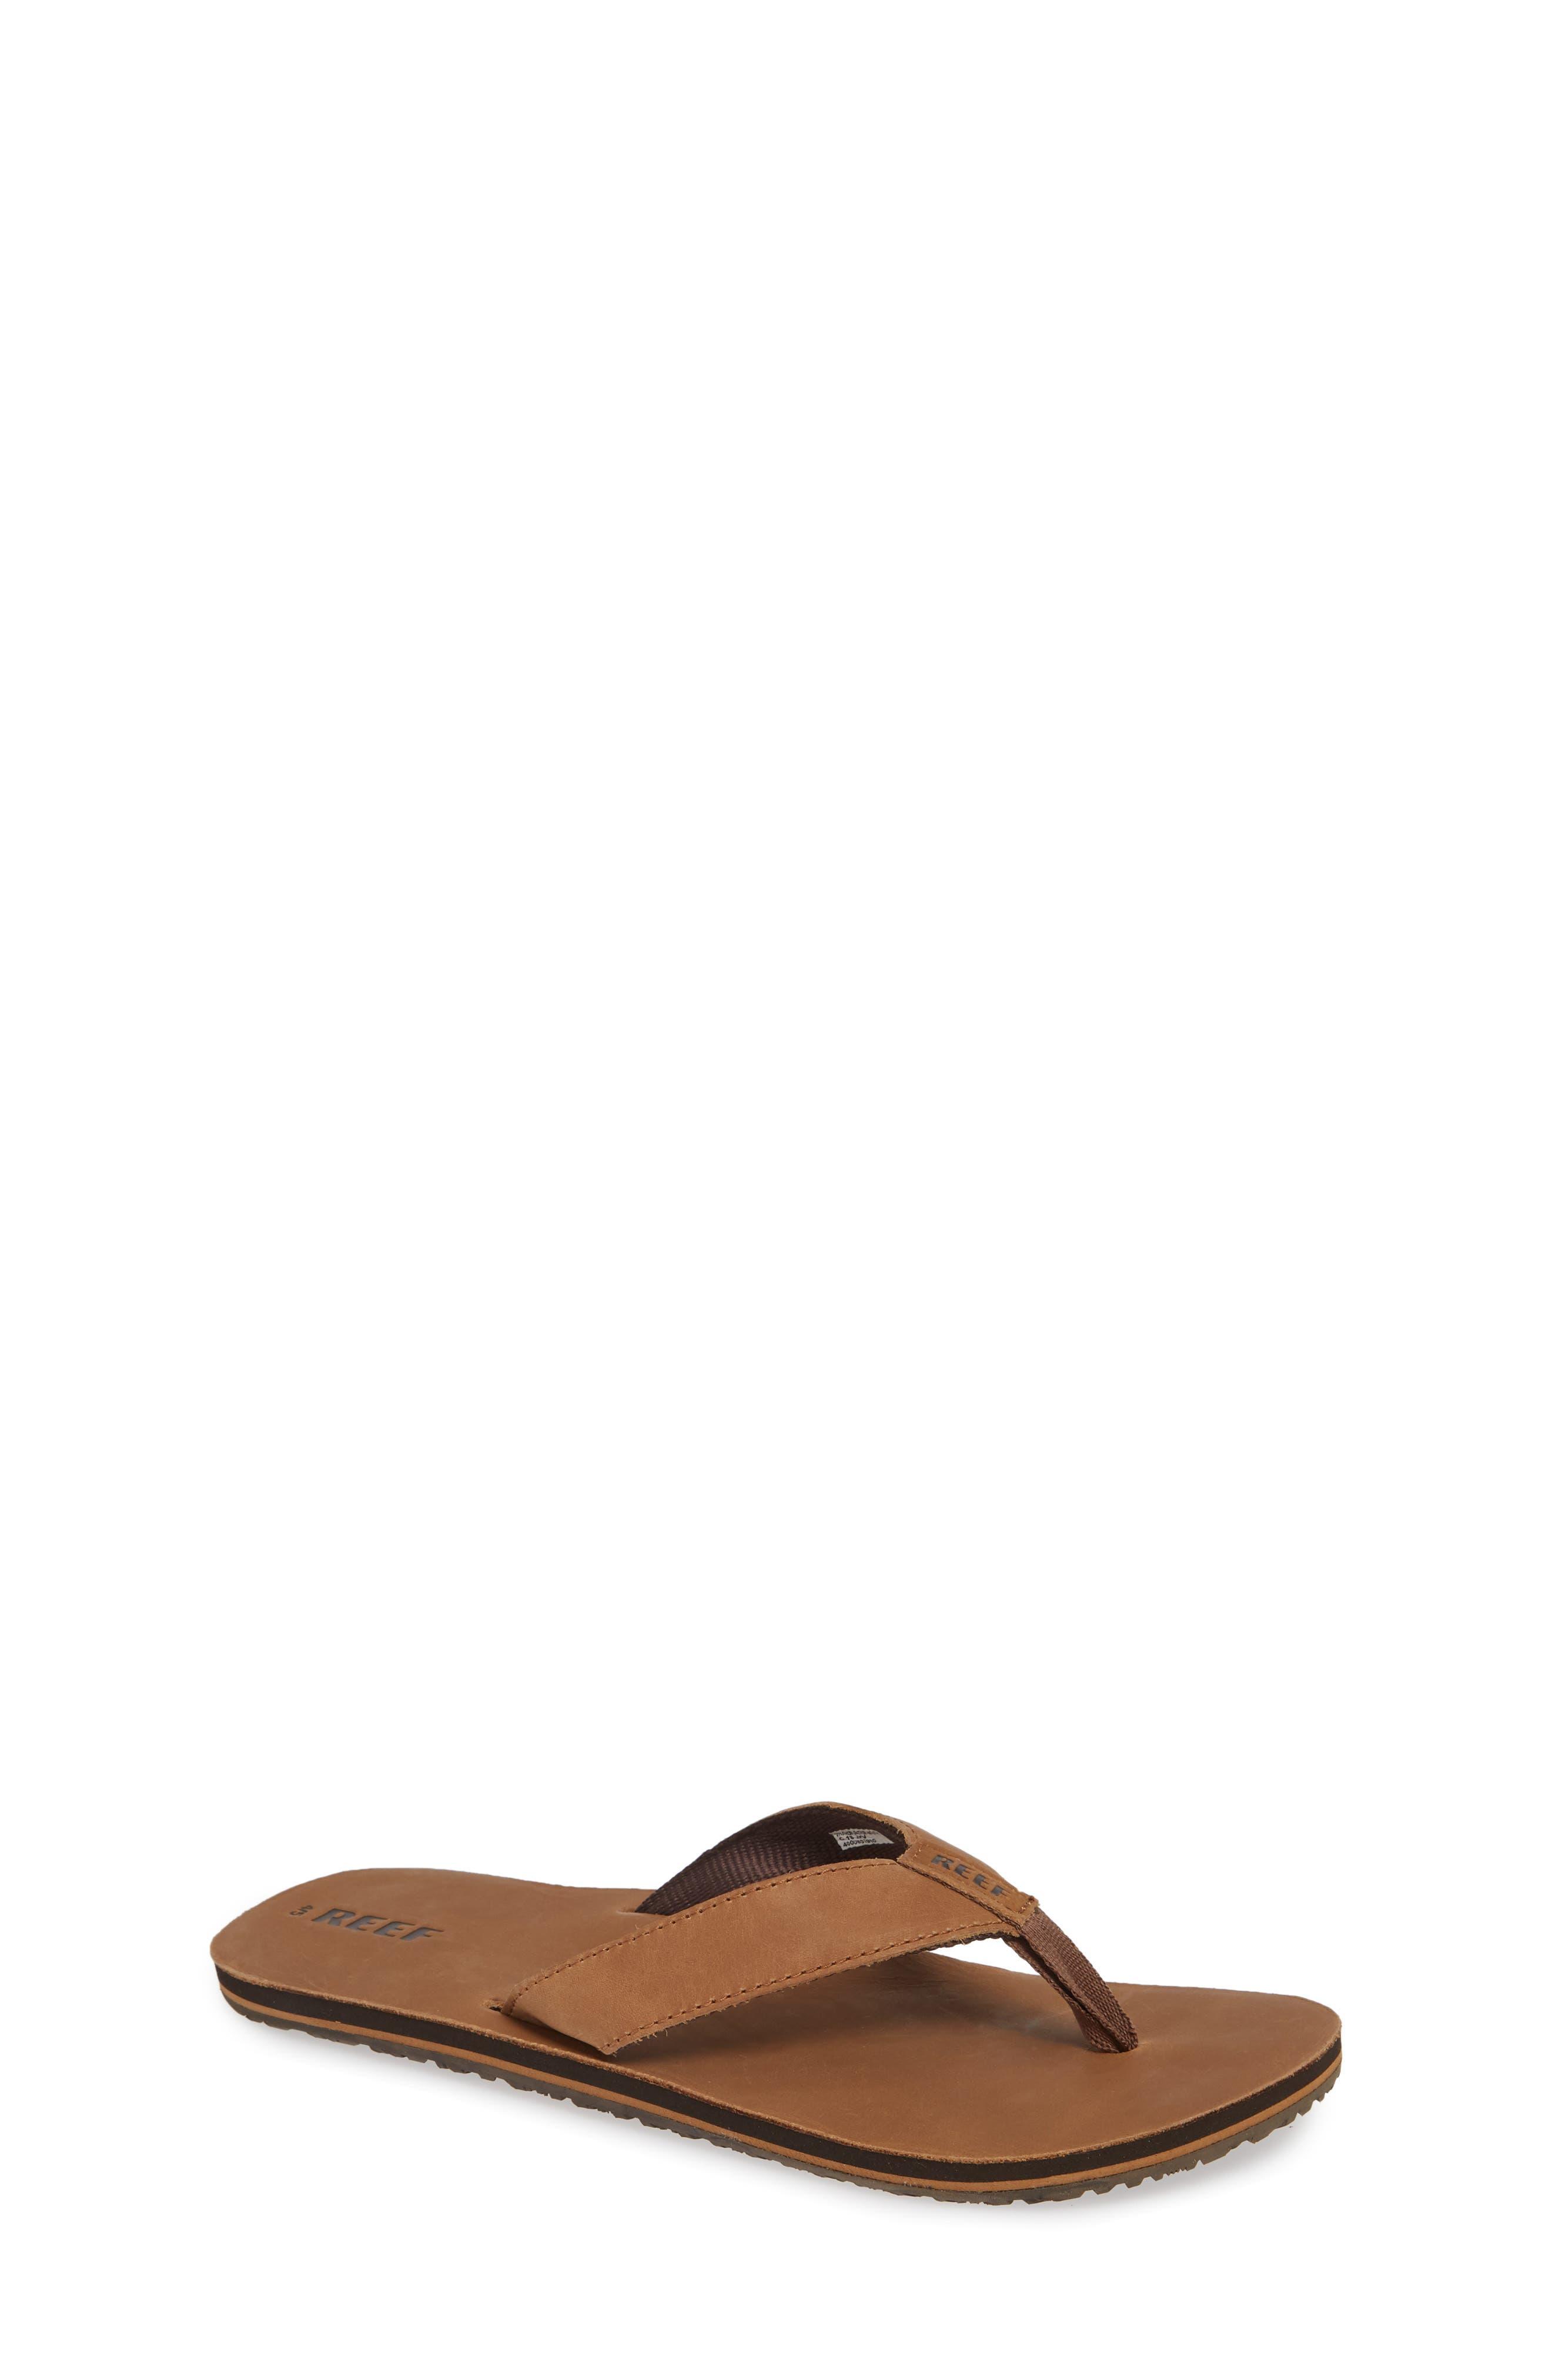 'Grom' Leather Flip-Flop,                             Main thumbnail 1, color,                             200